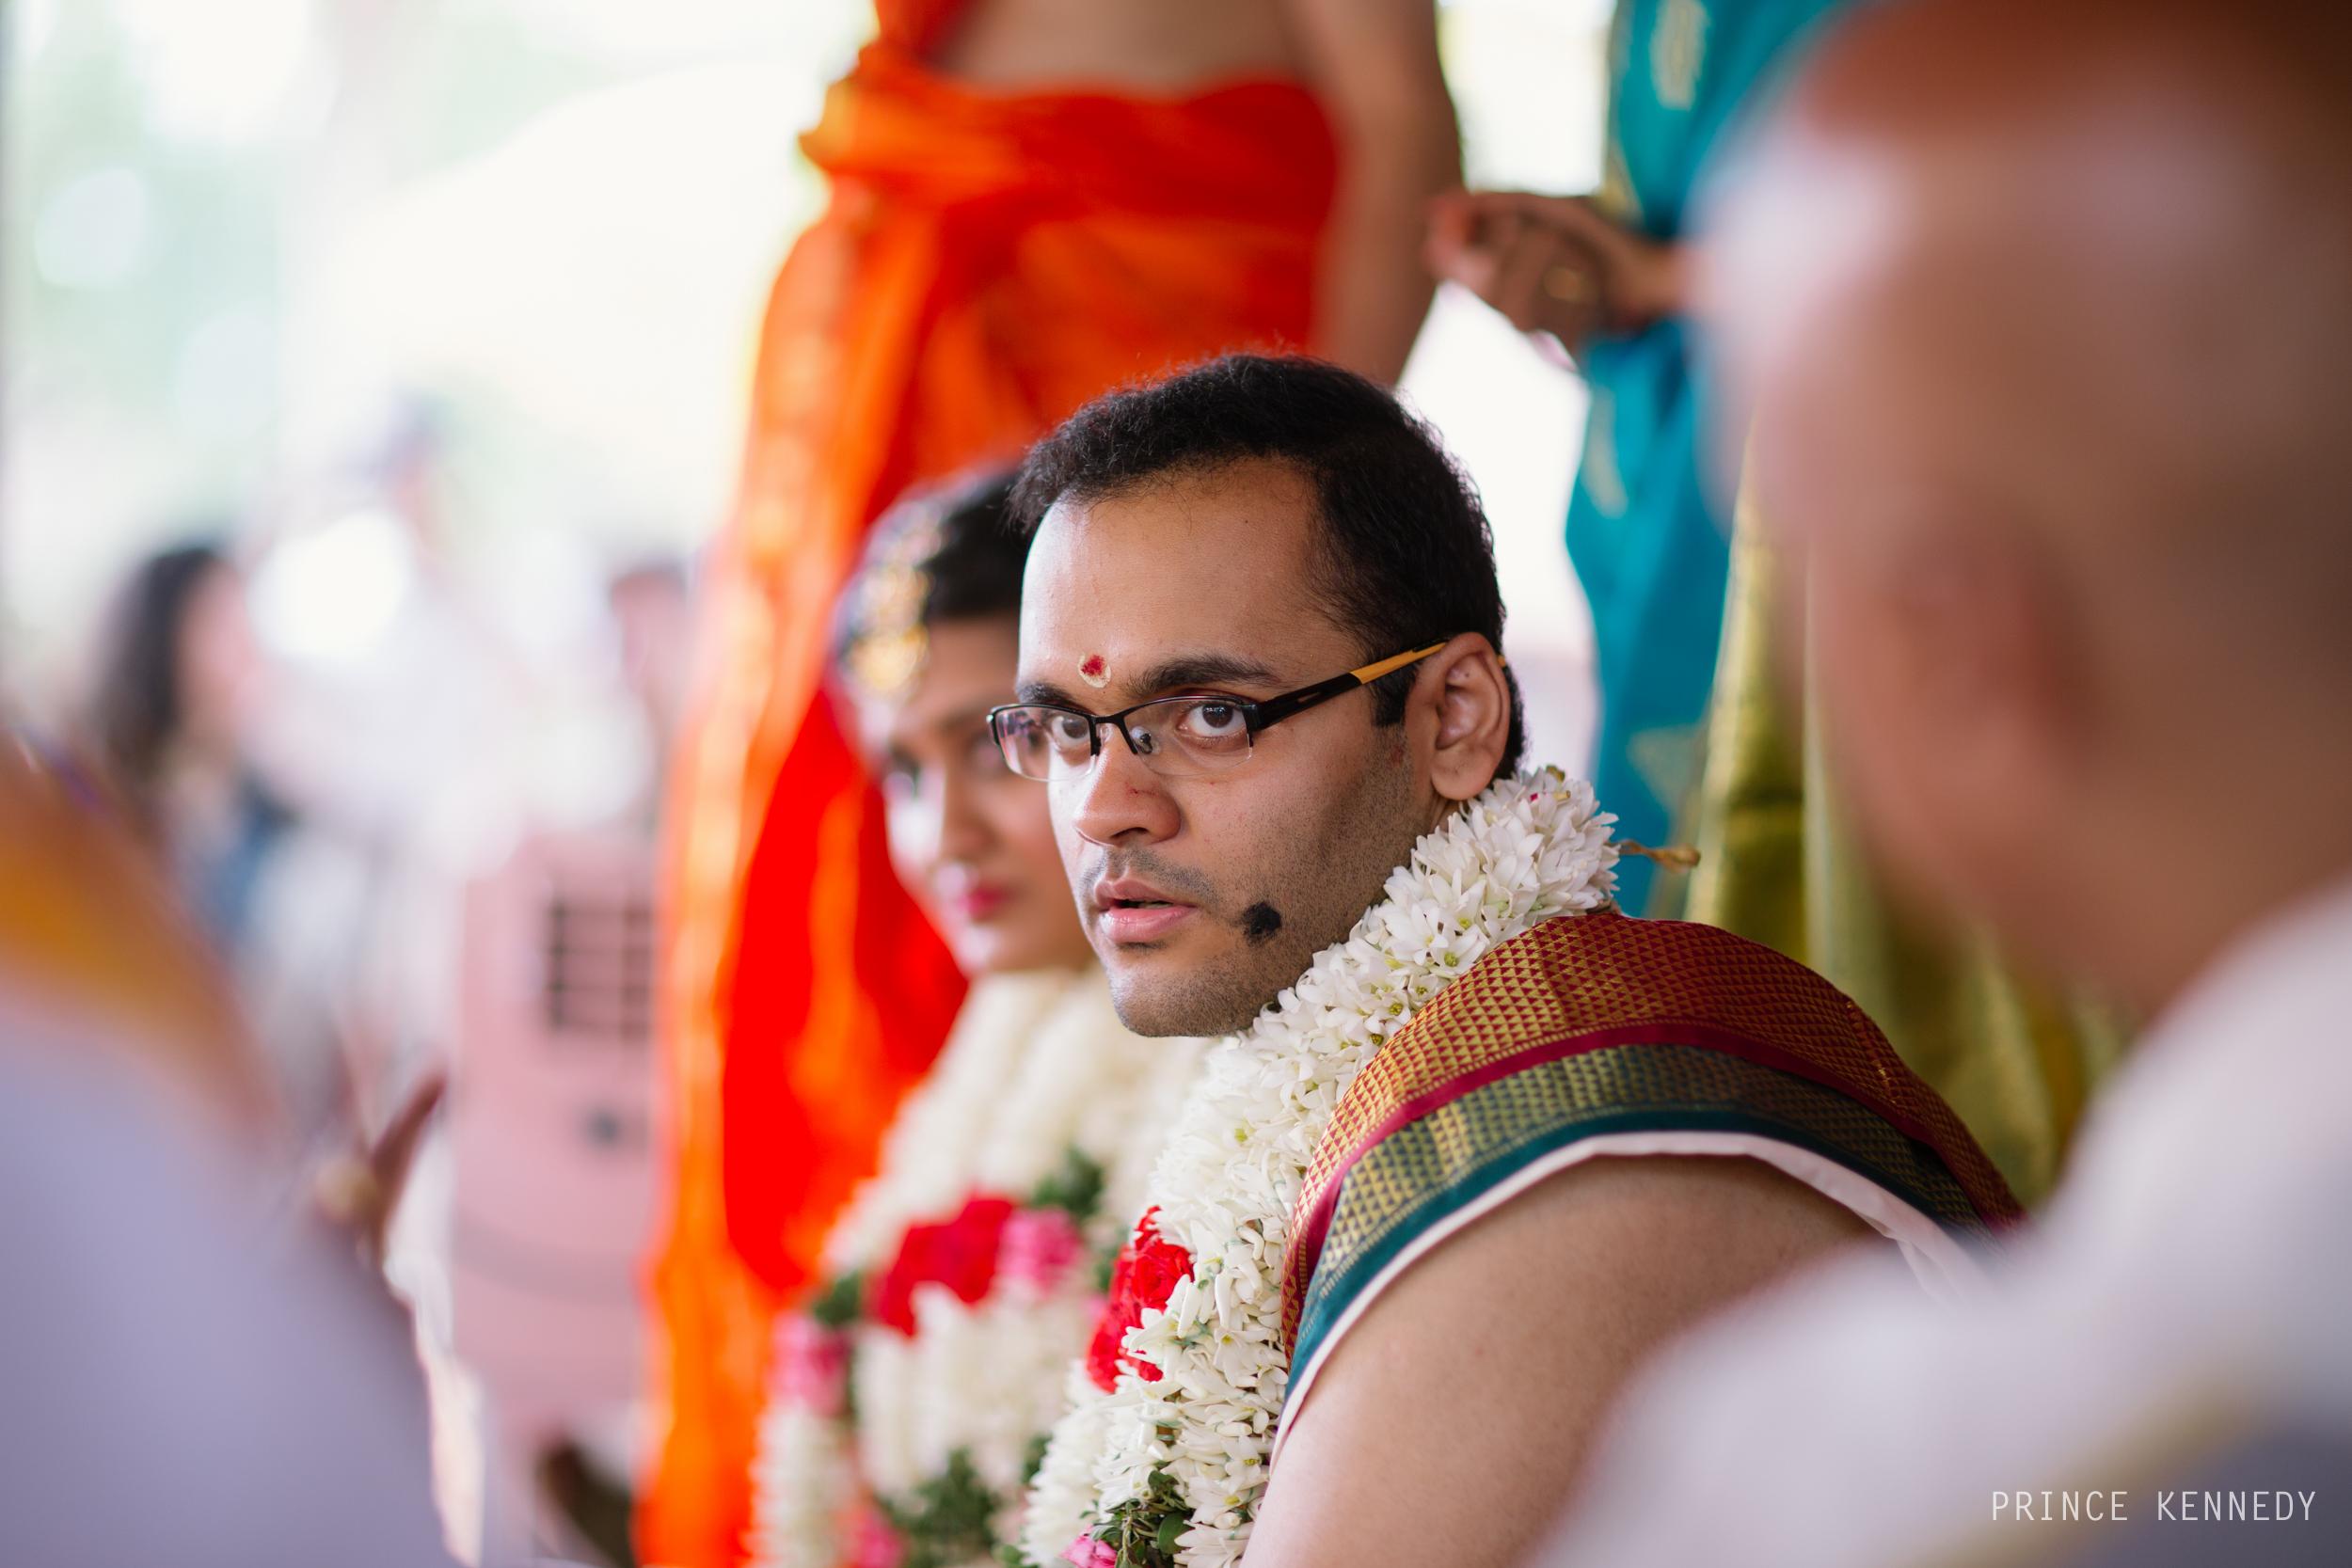 Athmajja-Nithesh-Engagement-Couple-Portrait-Portraiture-Wedding-Couple-Portrait-Chennai-Photographer-Candid-Photography-Destination-Best-Prince-Kennedy-Photography-208.jpg